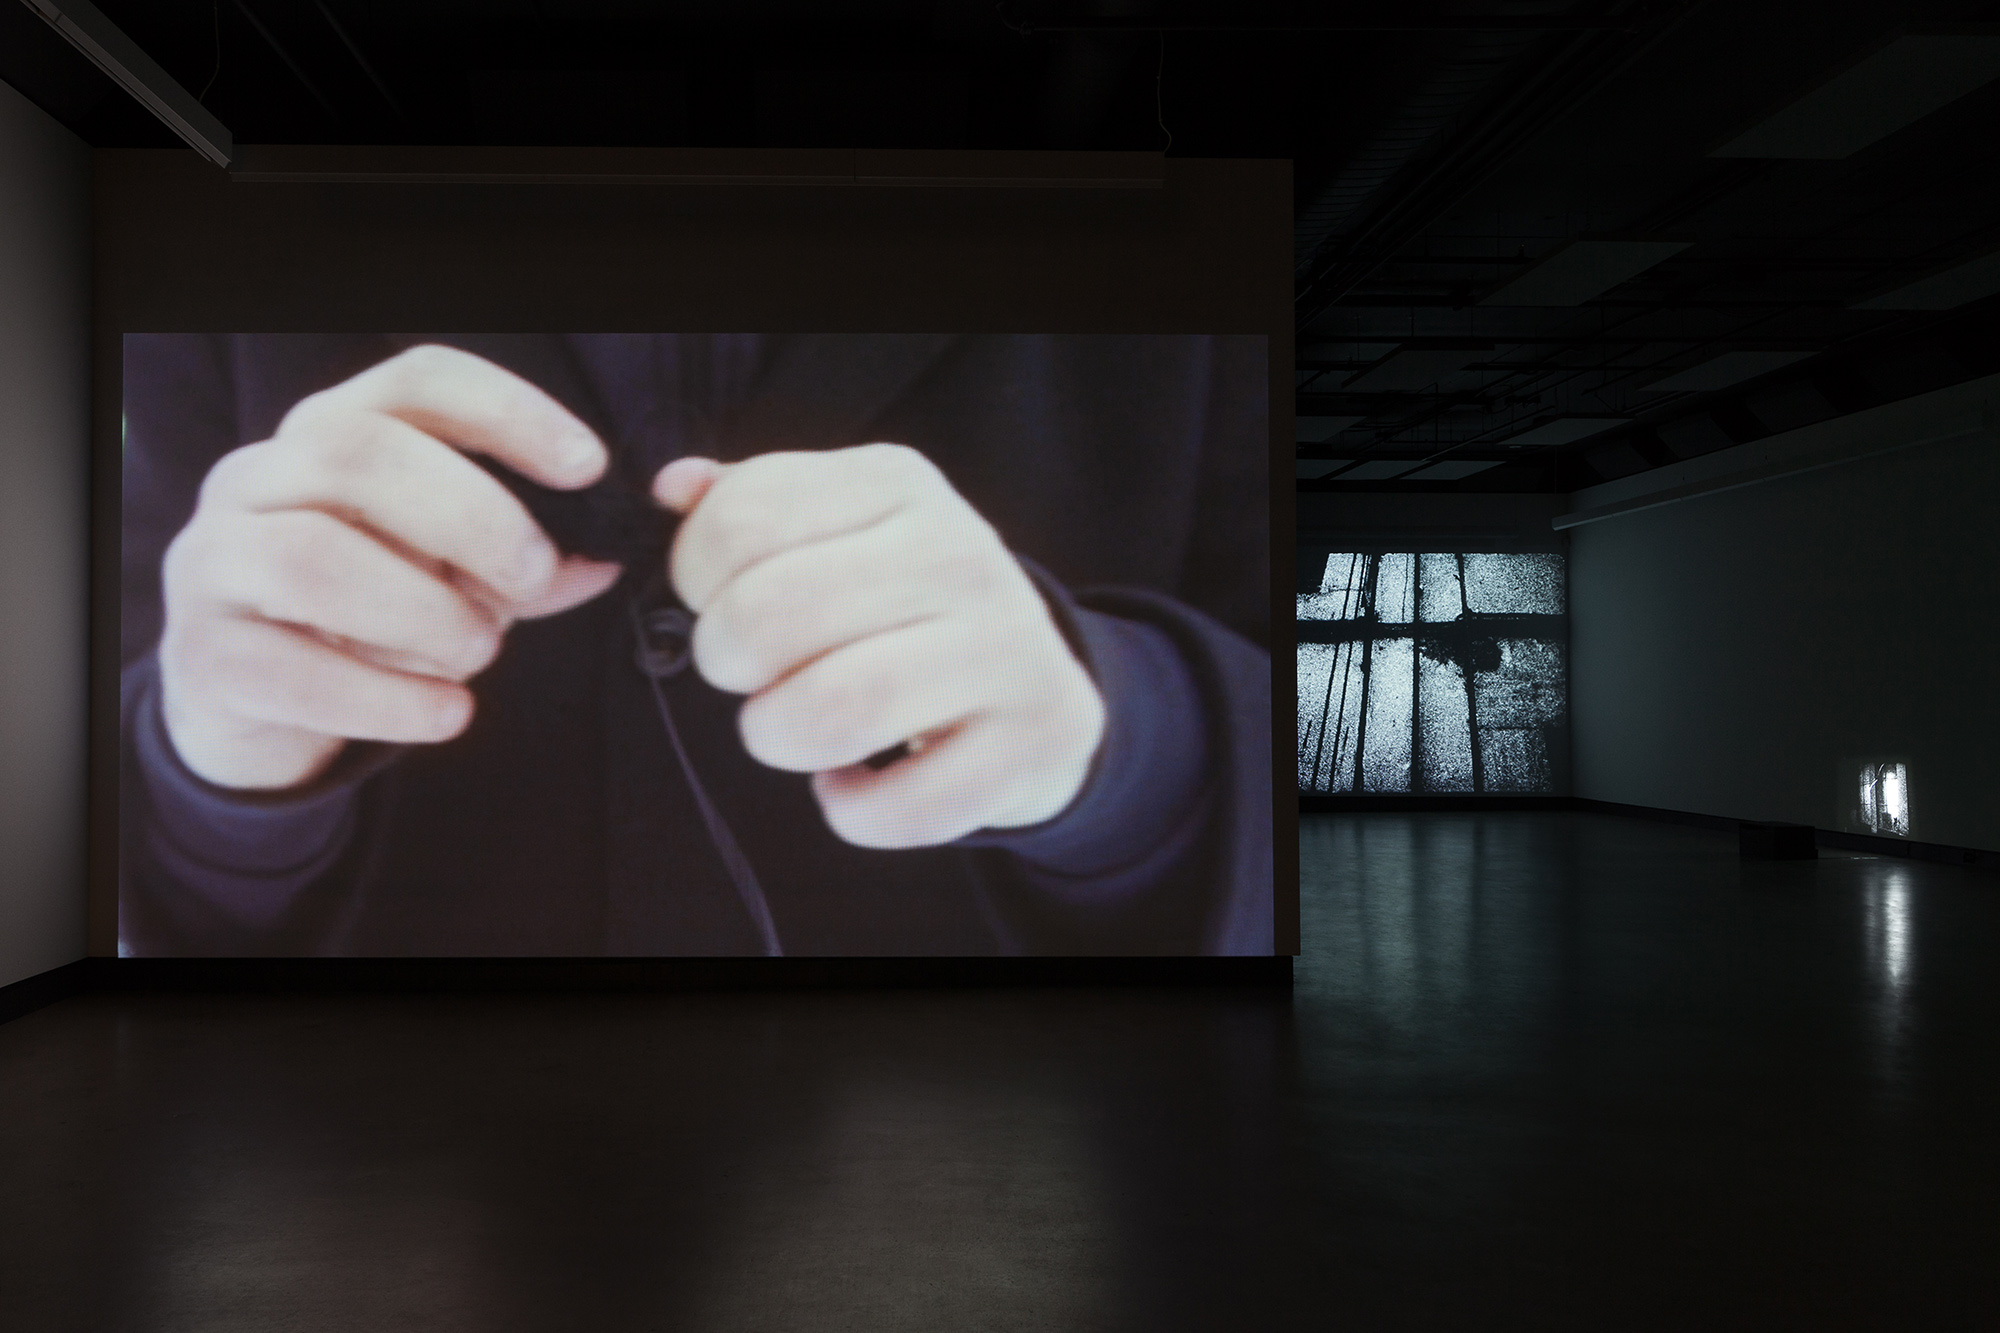 © Exhibition view,  Ismaïl Bahri + James Benning + Ralitsa Doncheva + Miriam Sampaio  (2018). Photo: Marilou Crispin.